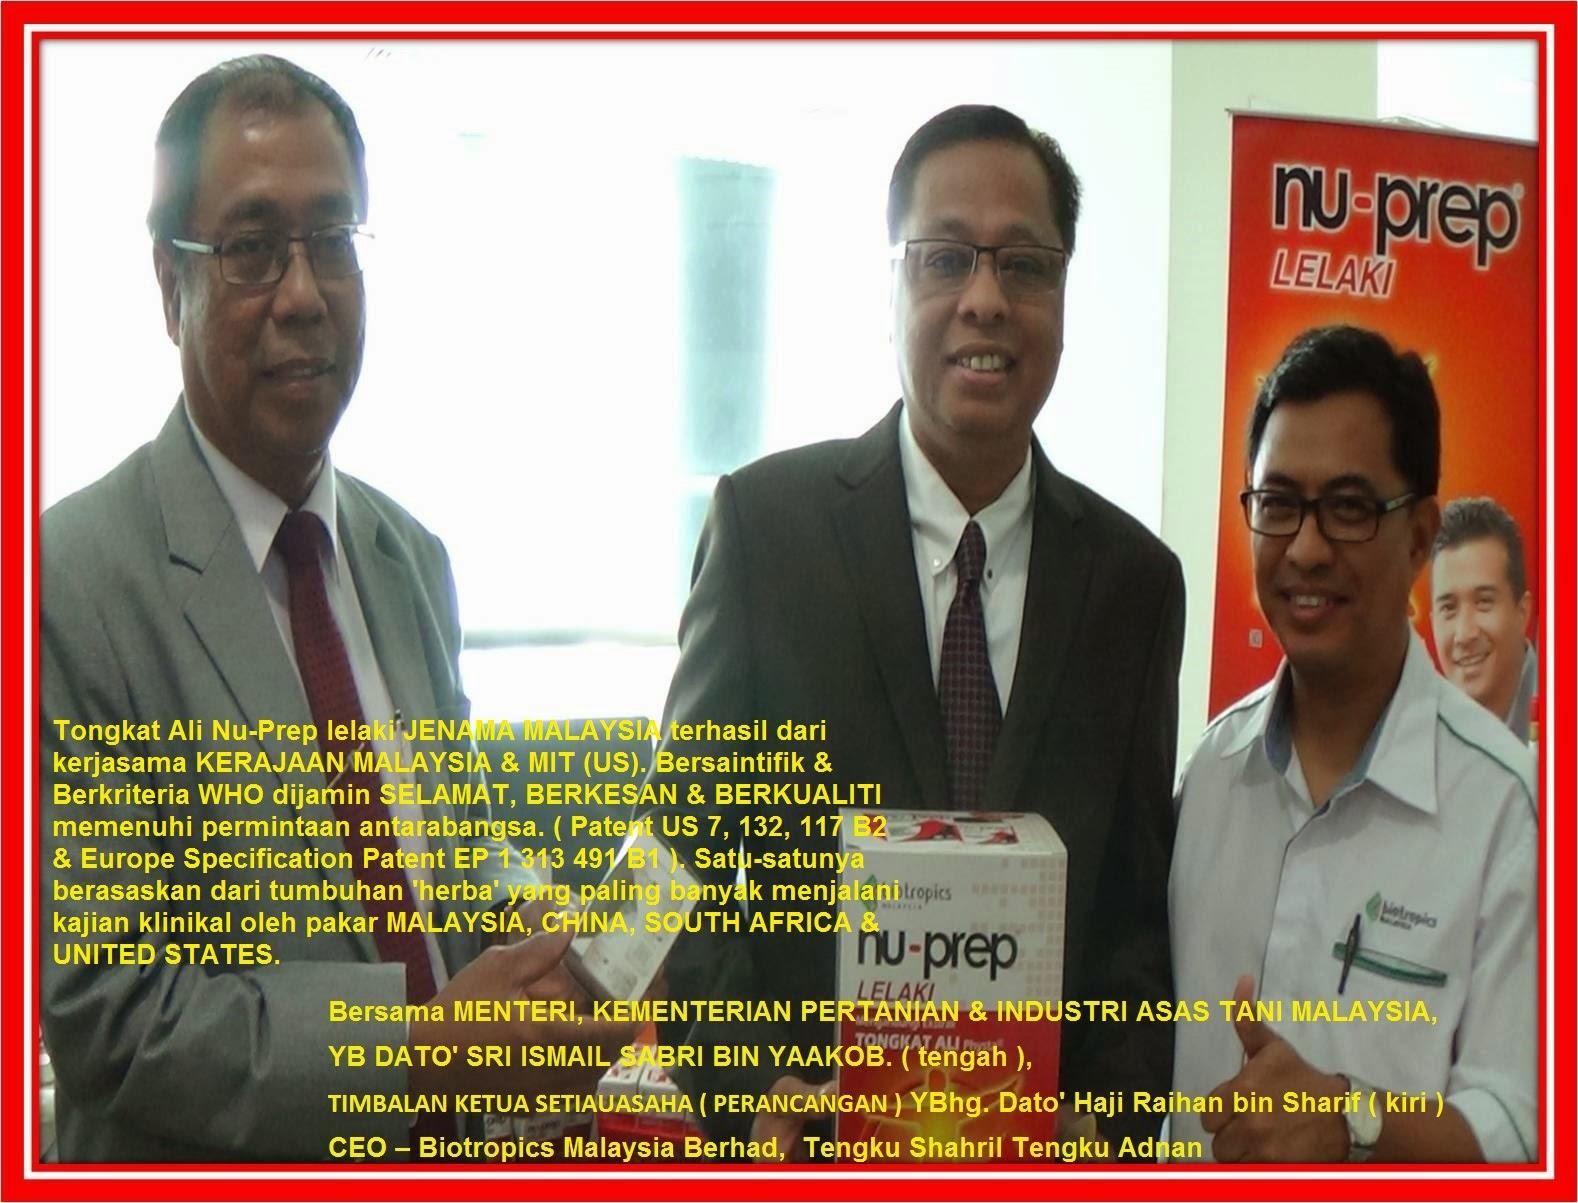 Majlis Pembangunan Herba Negara Contoh Produk Peneraju Herba Negara